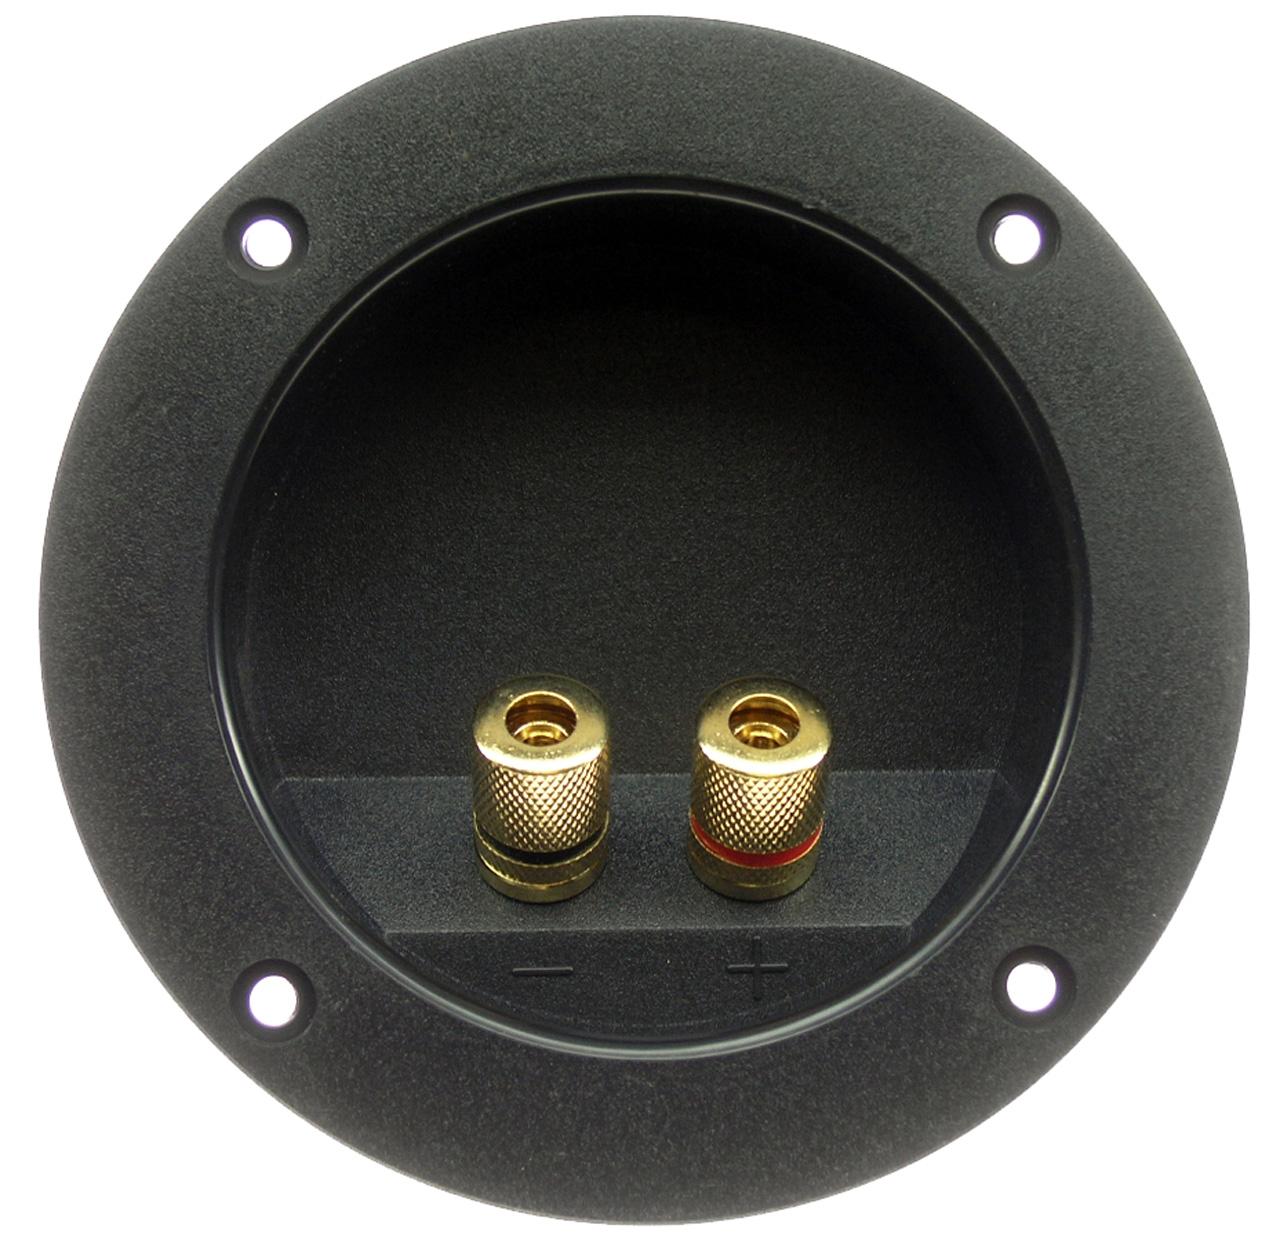 Speaker Terminal Connector, 5 Way Gold Binding Posts, RGT-4000